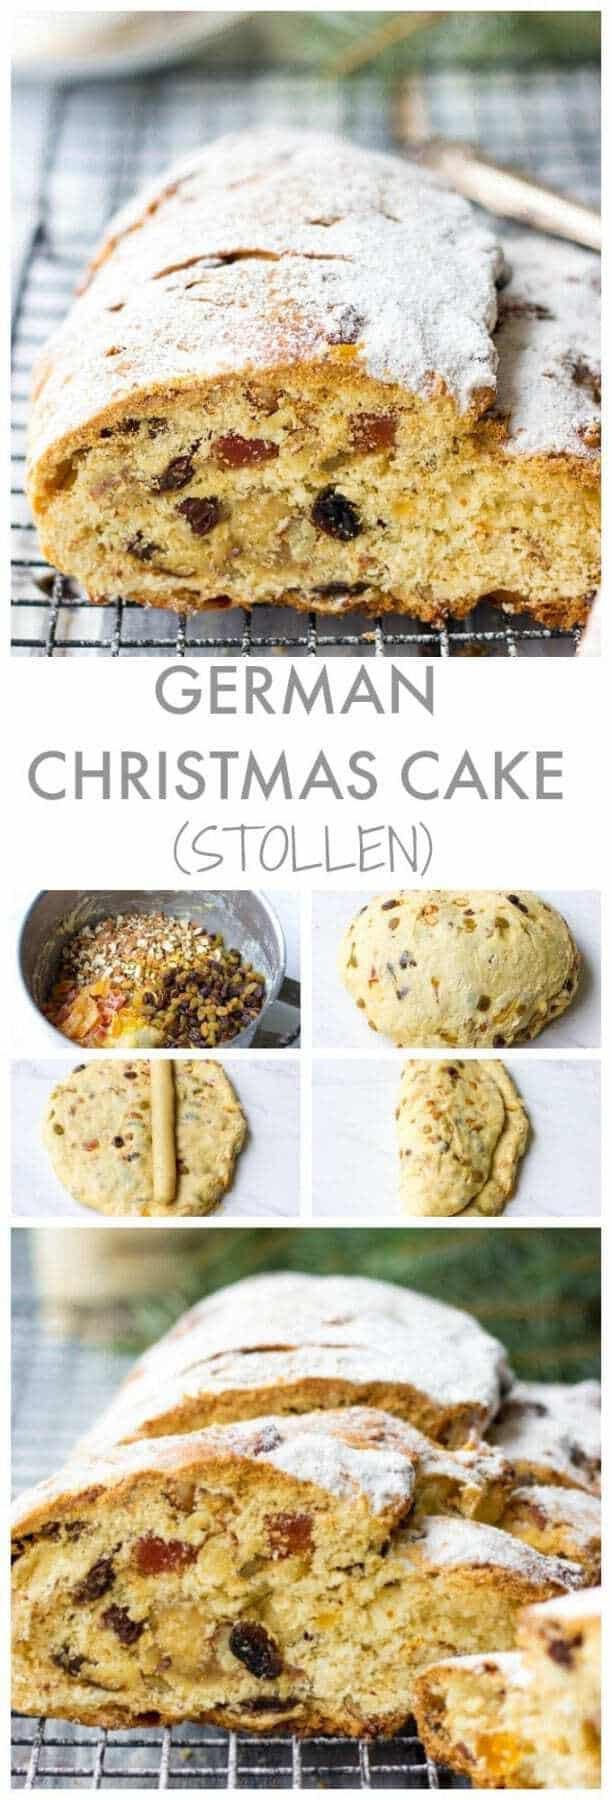 Traditional German Christmas Desserts  German Christmas Cake Stollen Recipe Lavender & Macarons